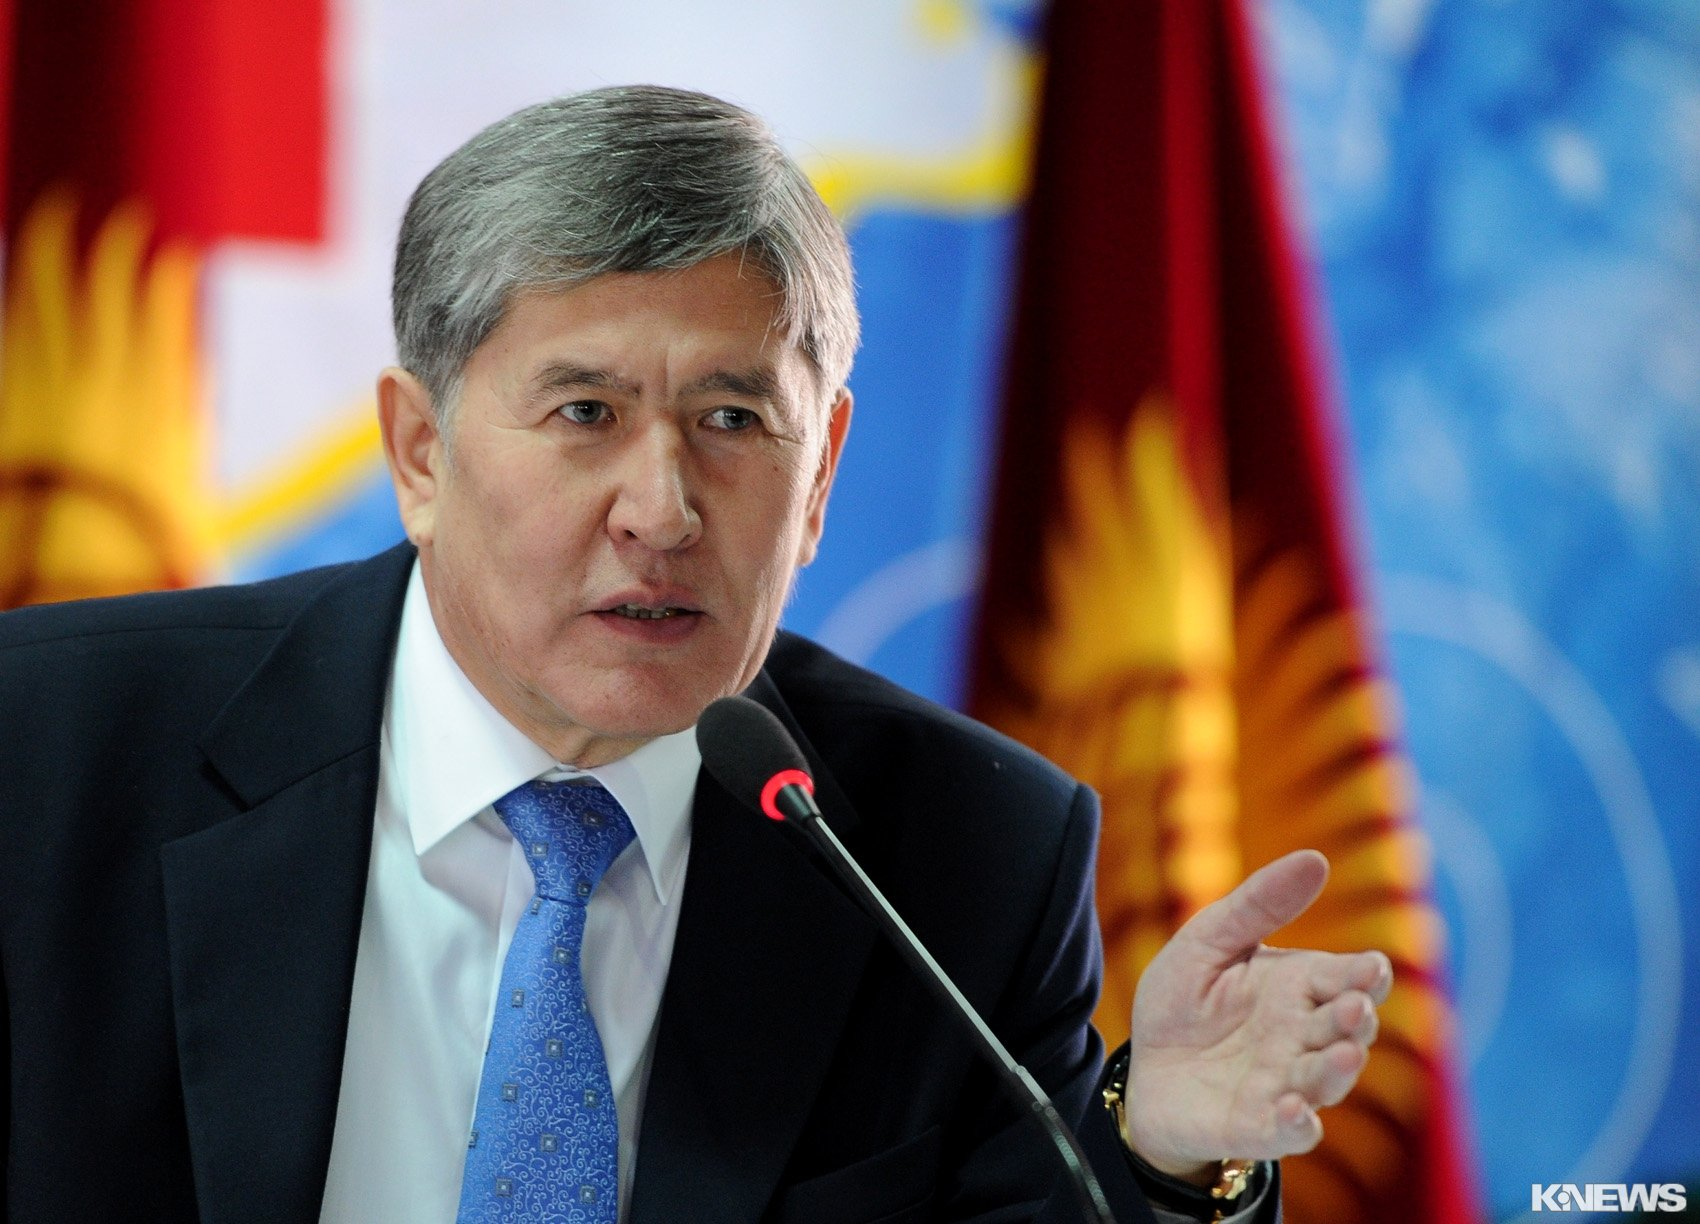 Атаmbayev Uighur